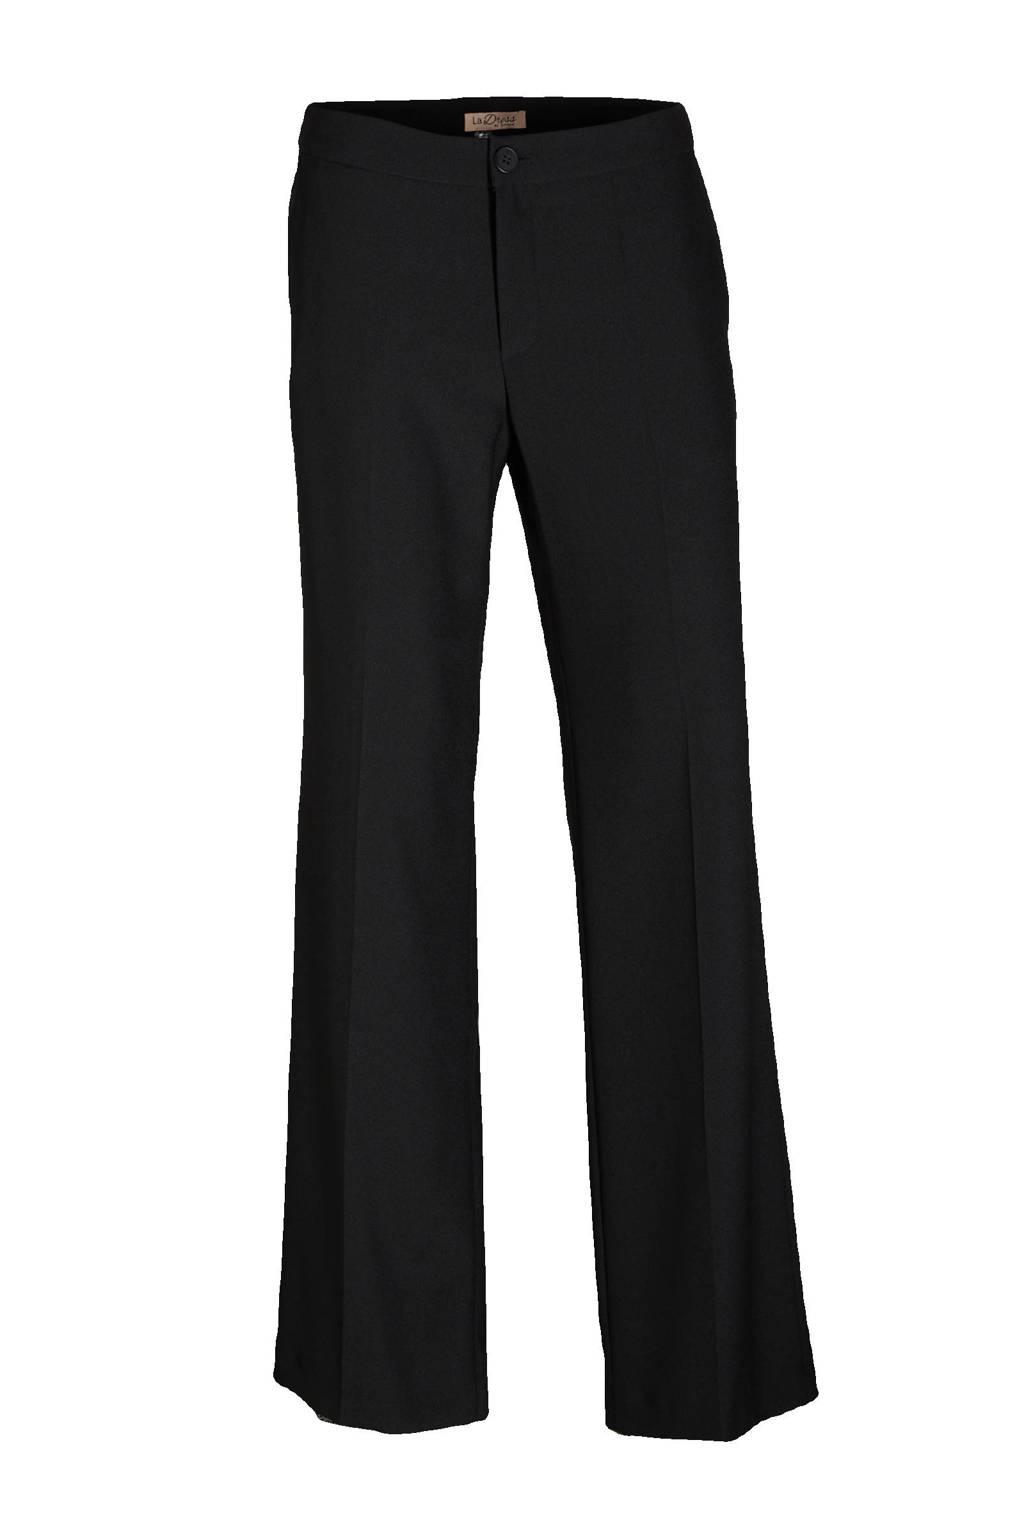 LaDress straight fit broek crepe satin zwart, Zwart